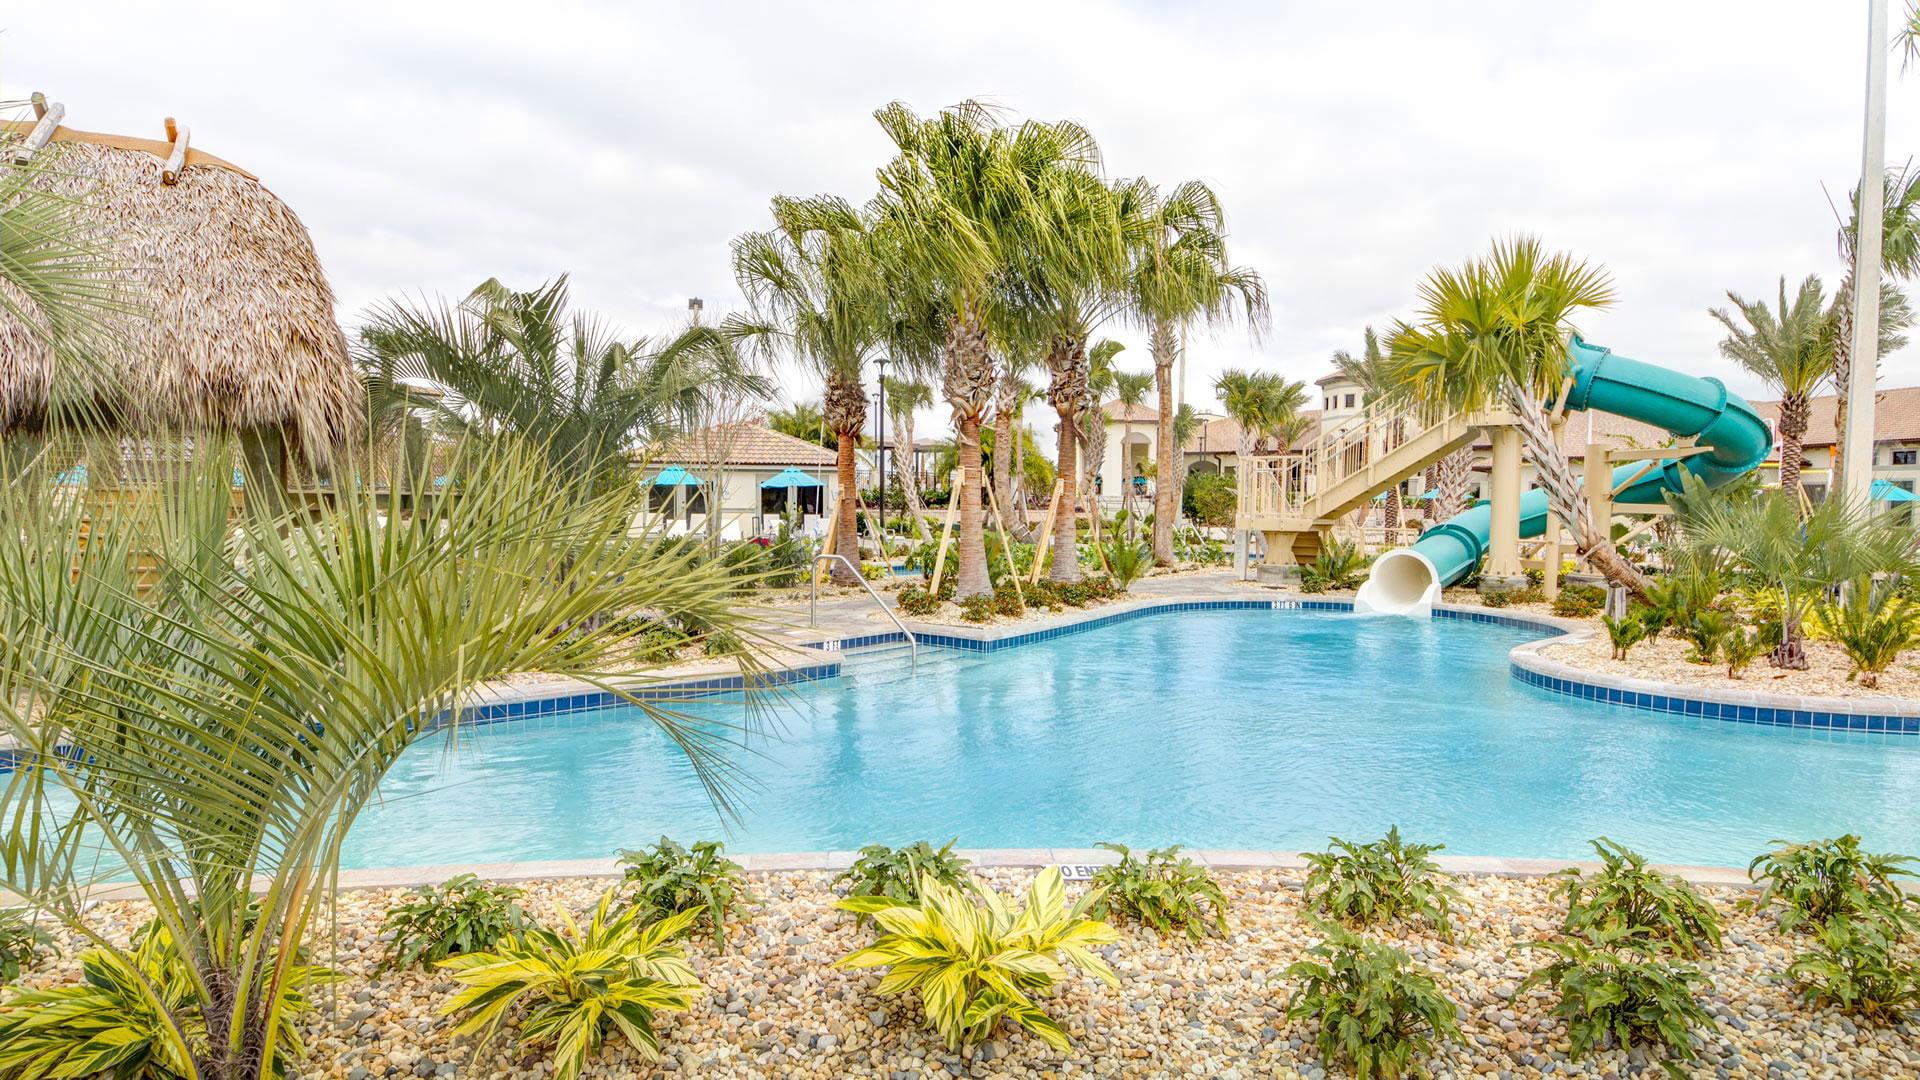 Water slides at Champions Gate Resort